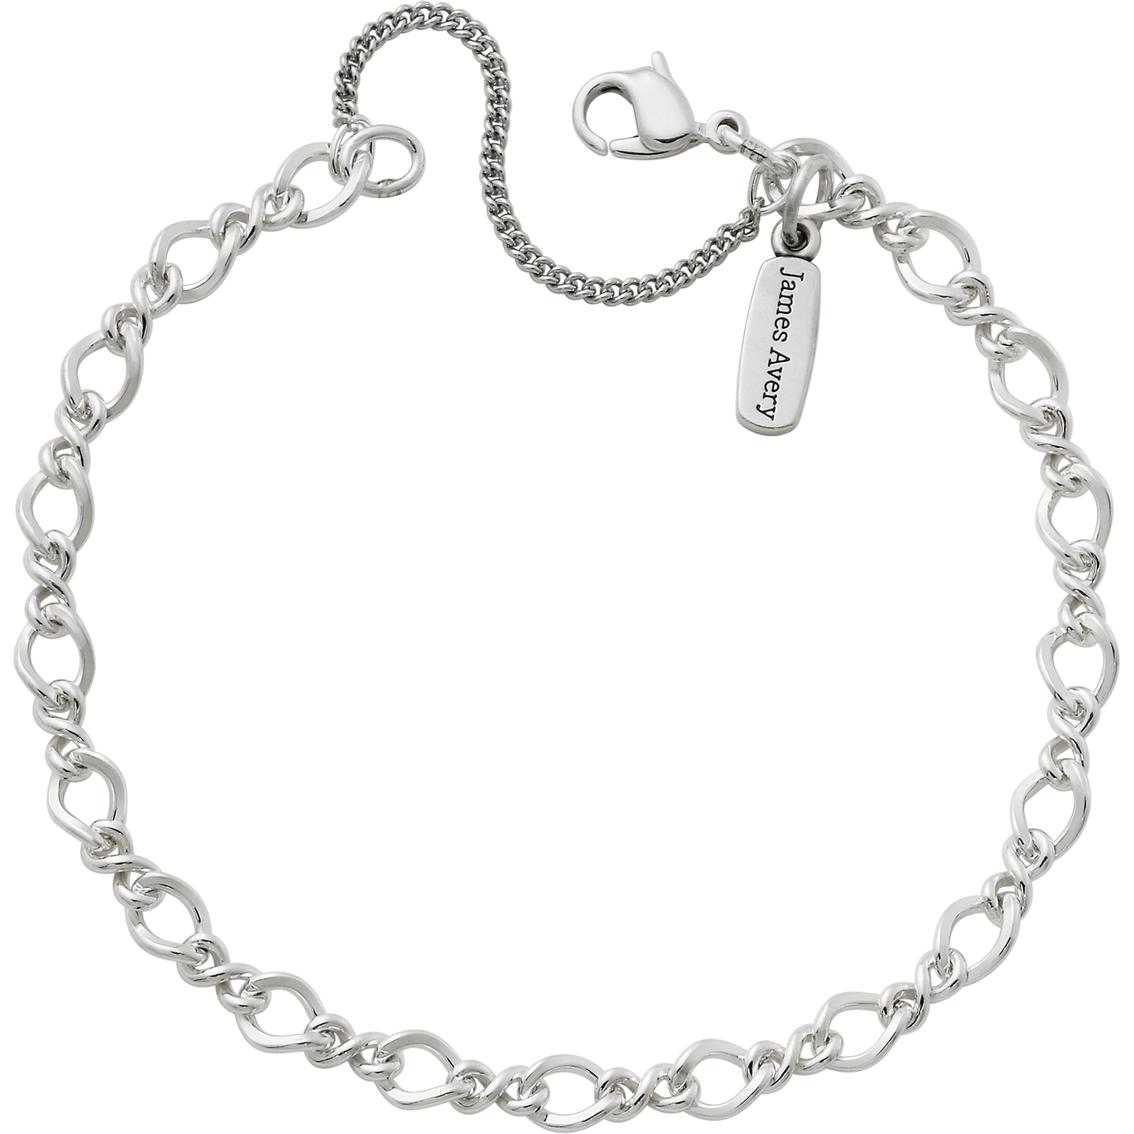 James Avery Medium Twist Charm Bracelet   Silver Bracelets ...